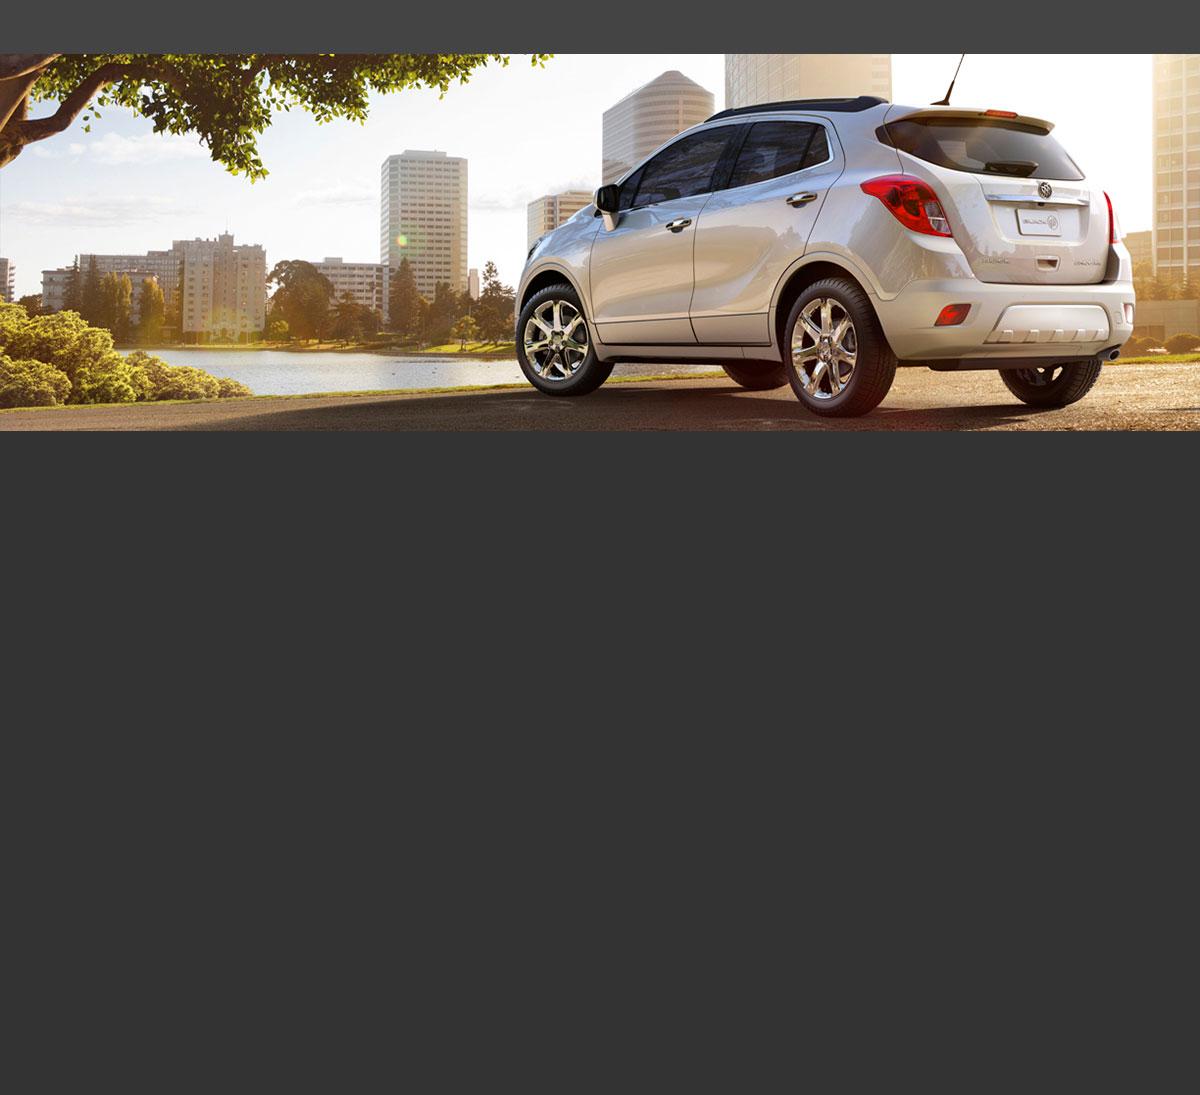 Chevrolet Dealerships In Va: Deals On Wheels Used Cars